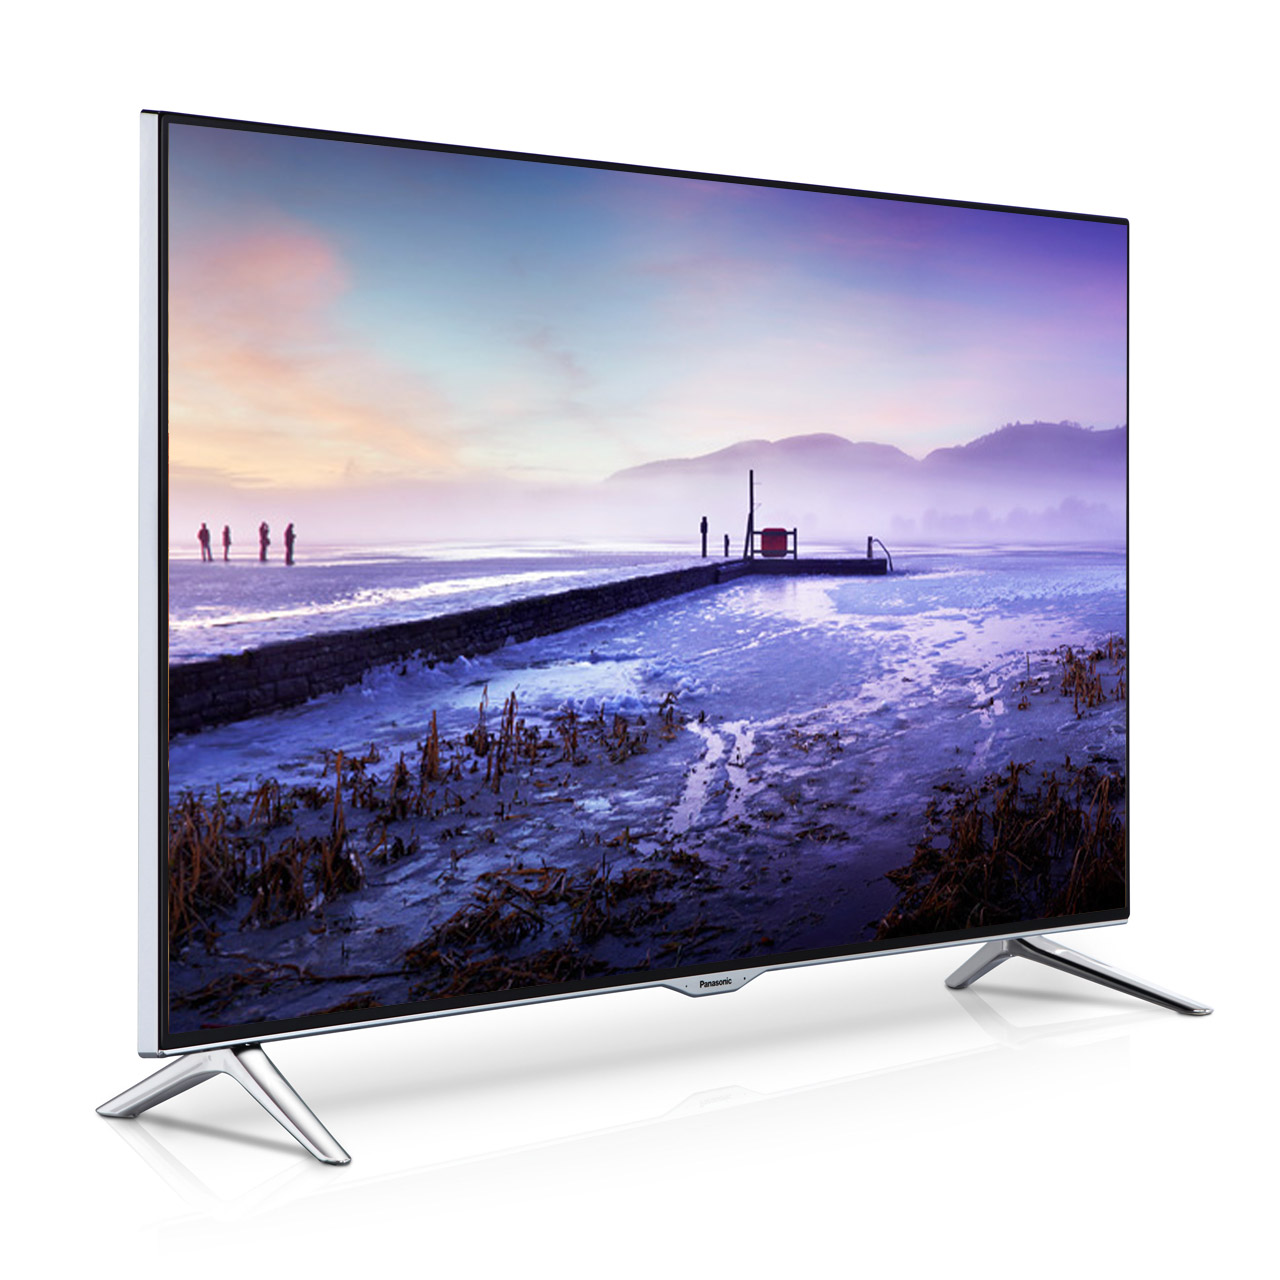 panasonic tx40cx400b 40 4k ultra hd 3d smart led tv 400hz. Black Bedroom Furniture Sets. Home Design Ideas